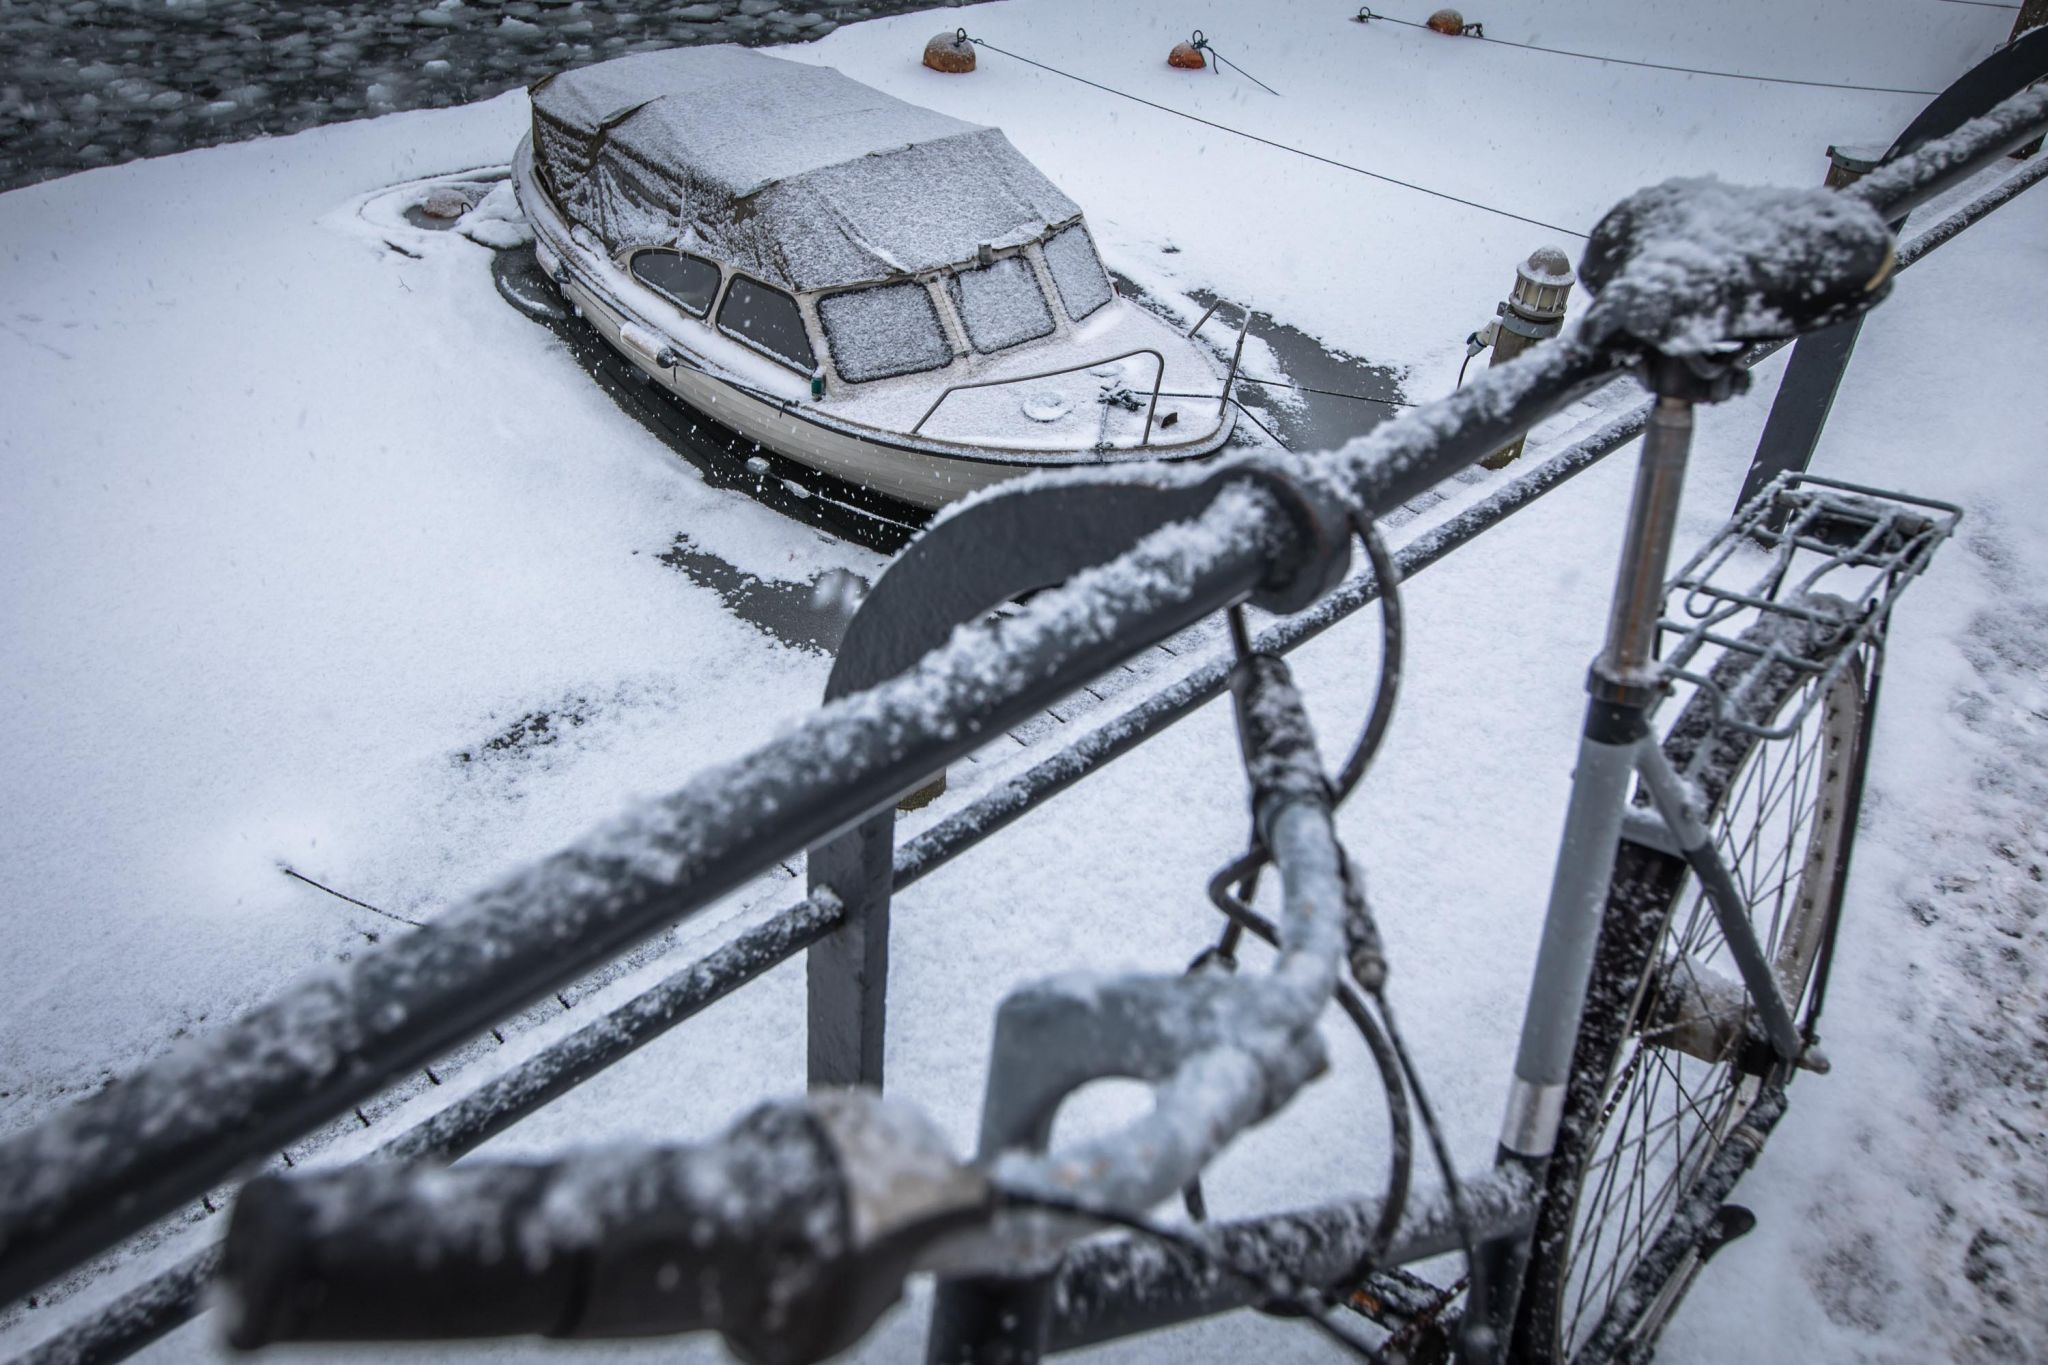 Copenhagen Bicycle & boat in the snow, Denmark